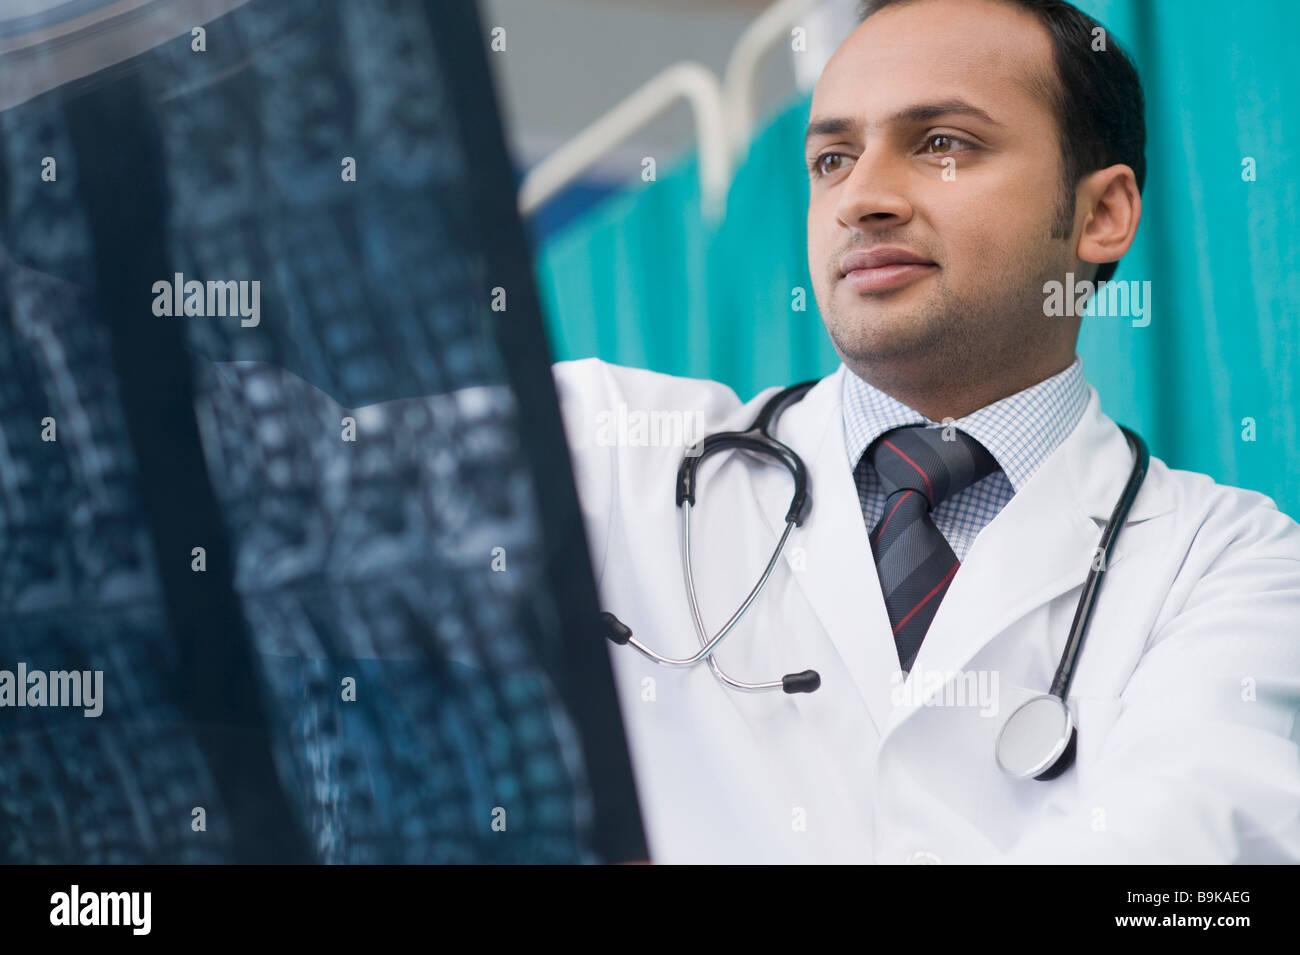 Médico examina un informe de rayos x Imagen De Stock